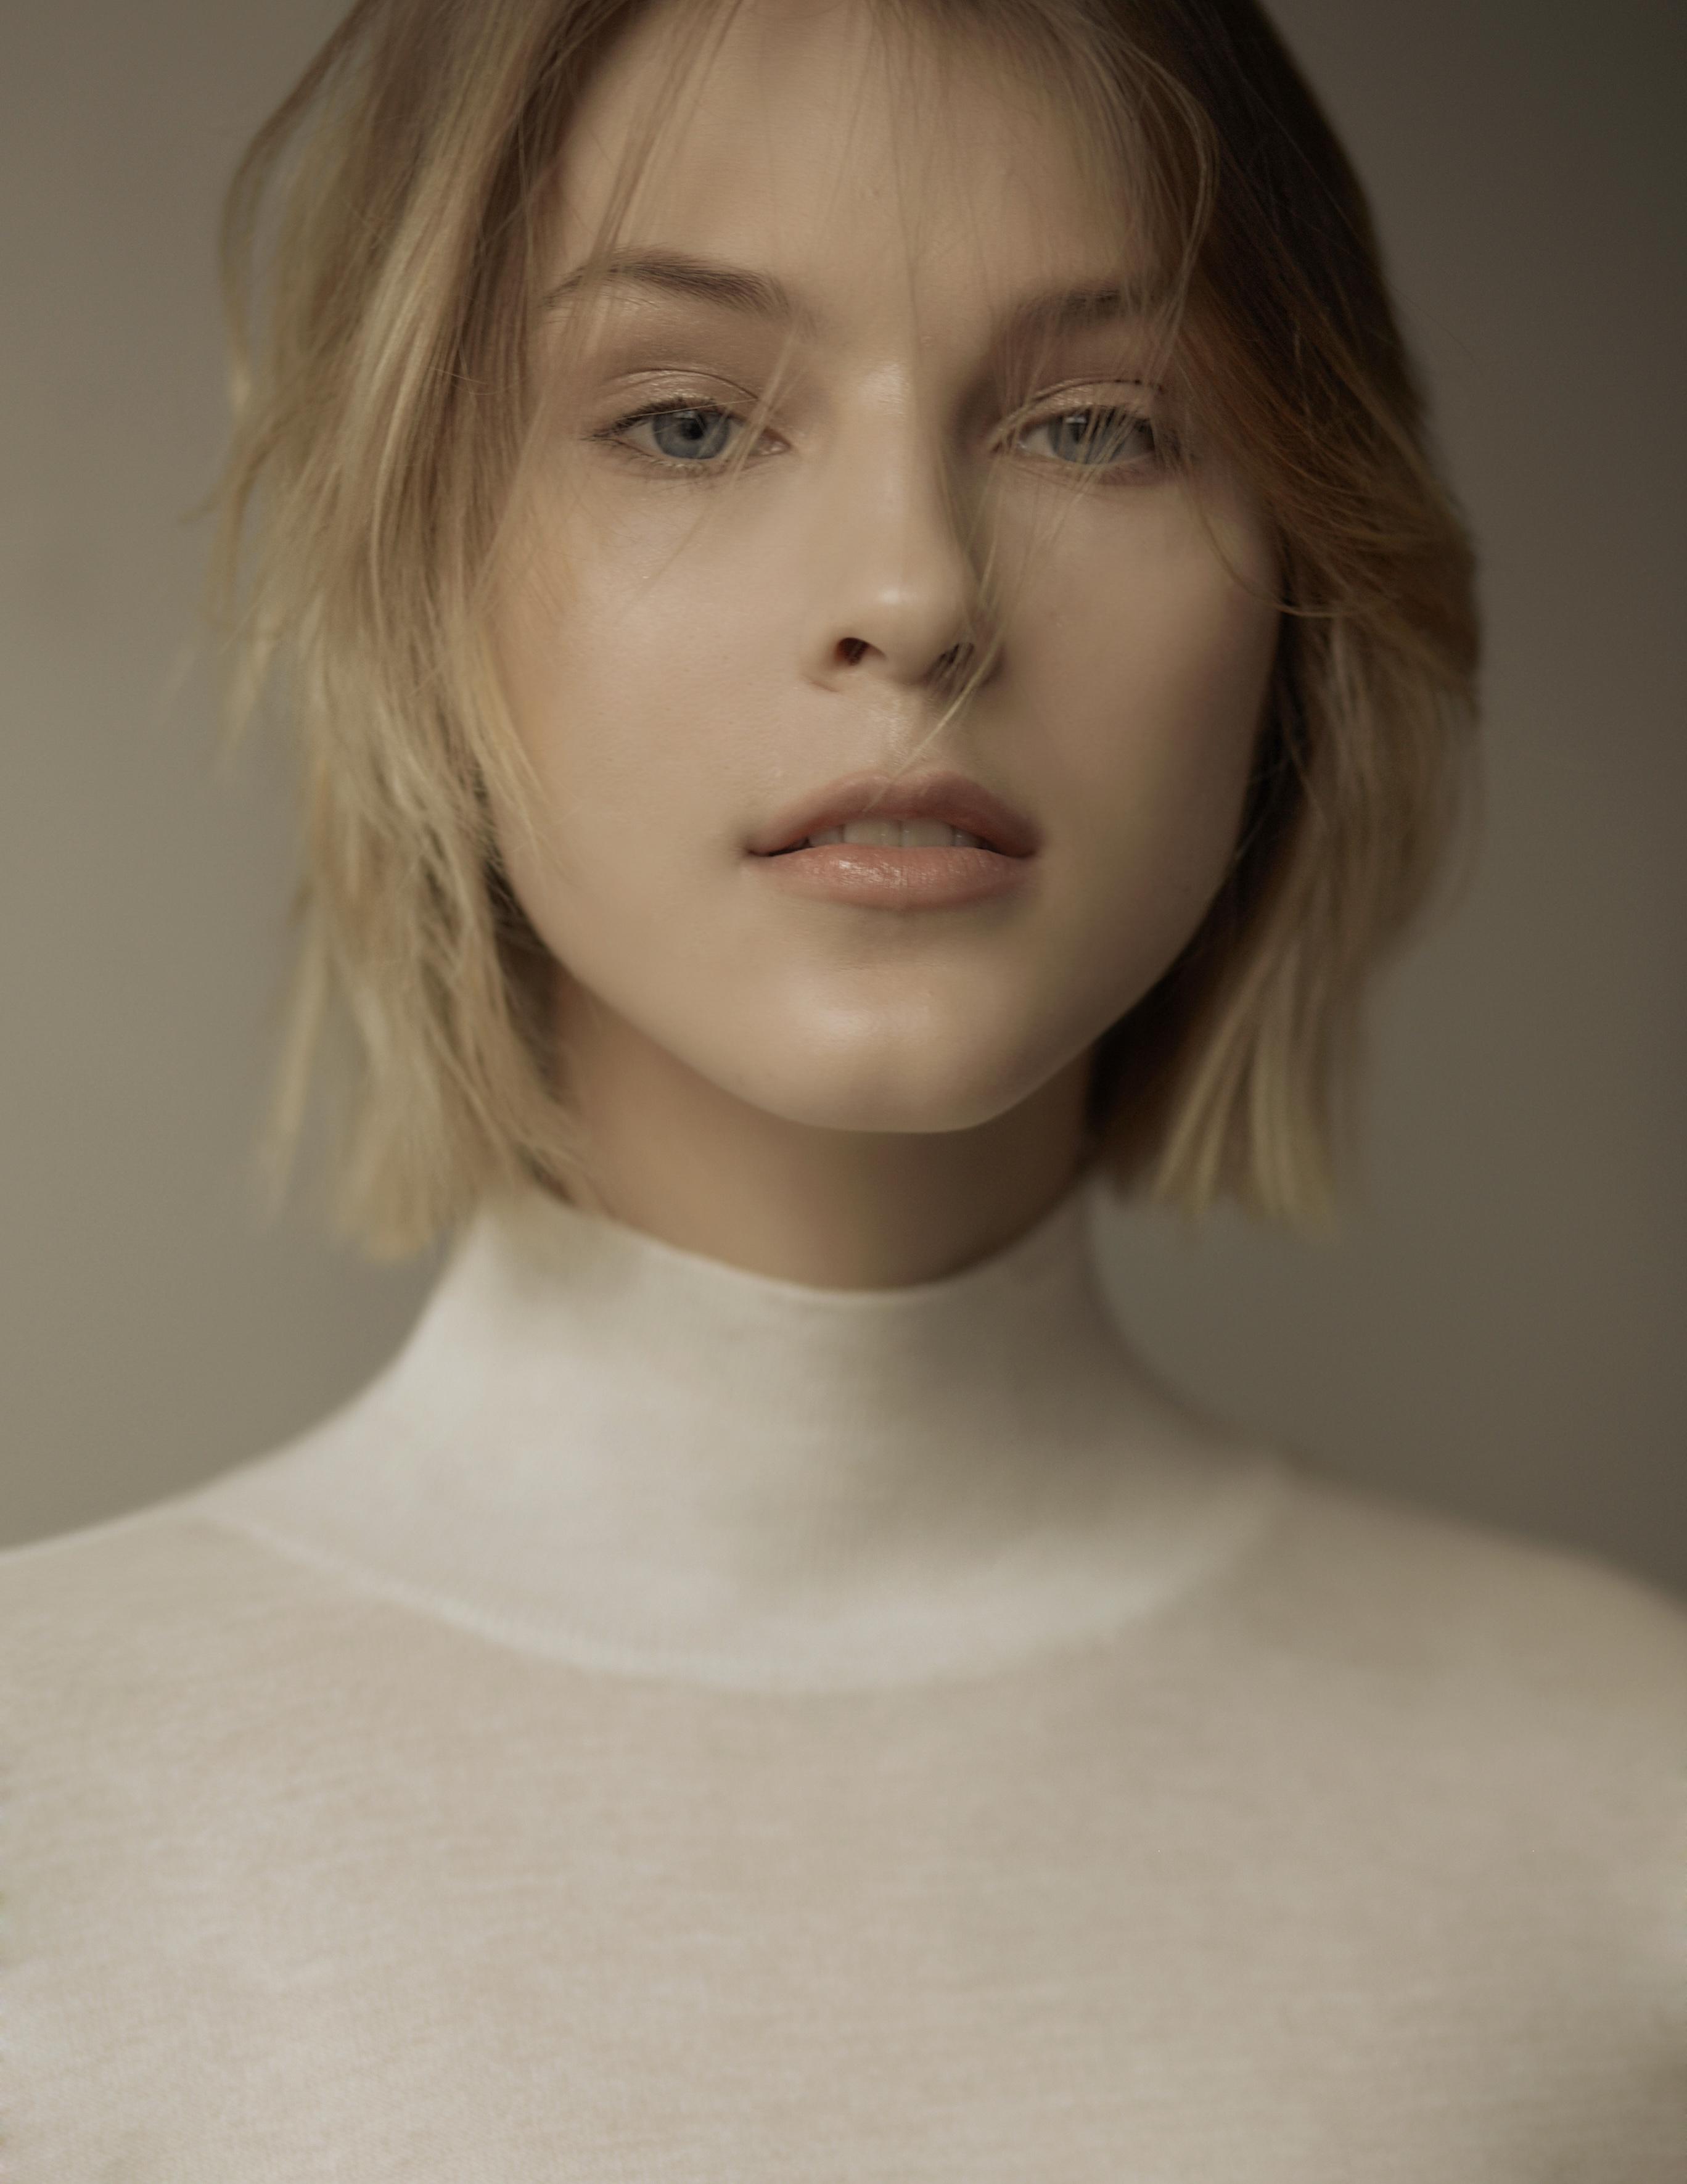 Model Factory Caucasian Female Model ElizaB